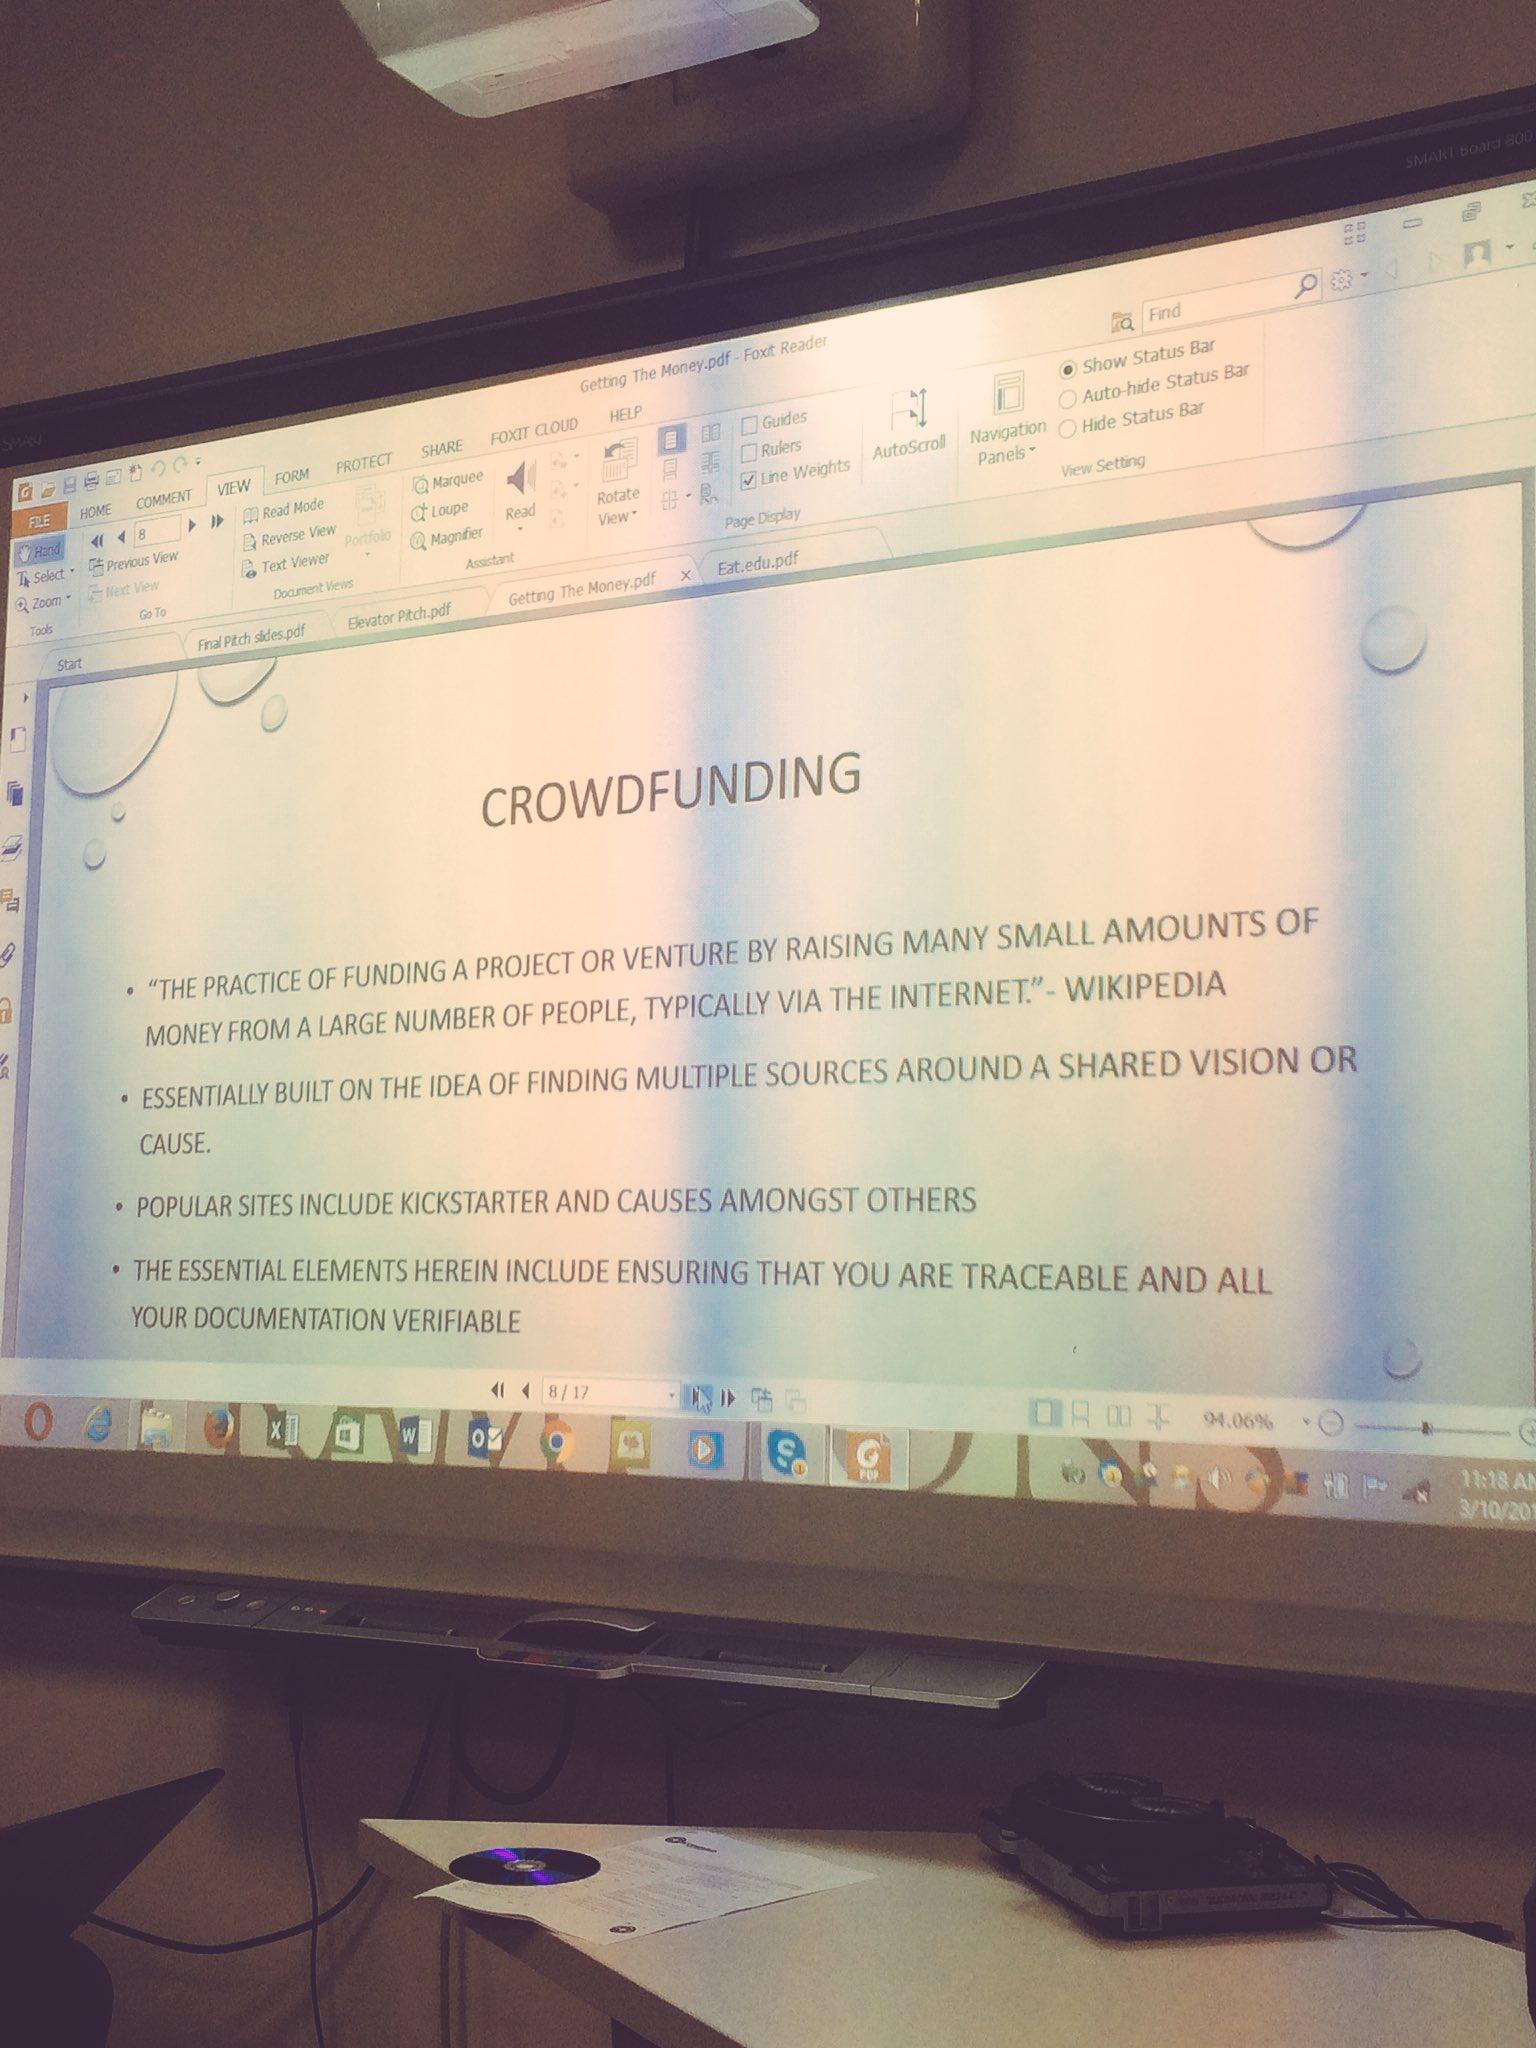 Solution 3 - Crowdfunding Getting the Funding @TangaiDavid #jumpstartbyo https://t.co/CIXhJuzARc